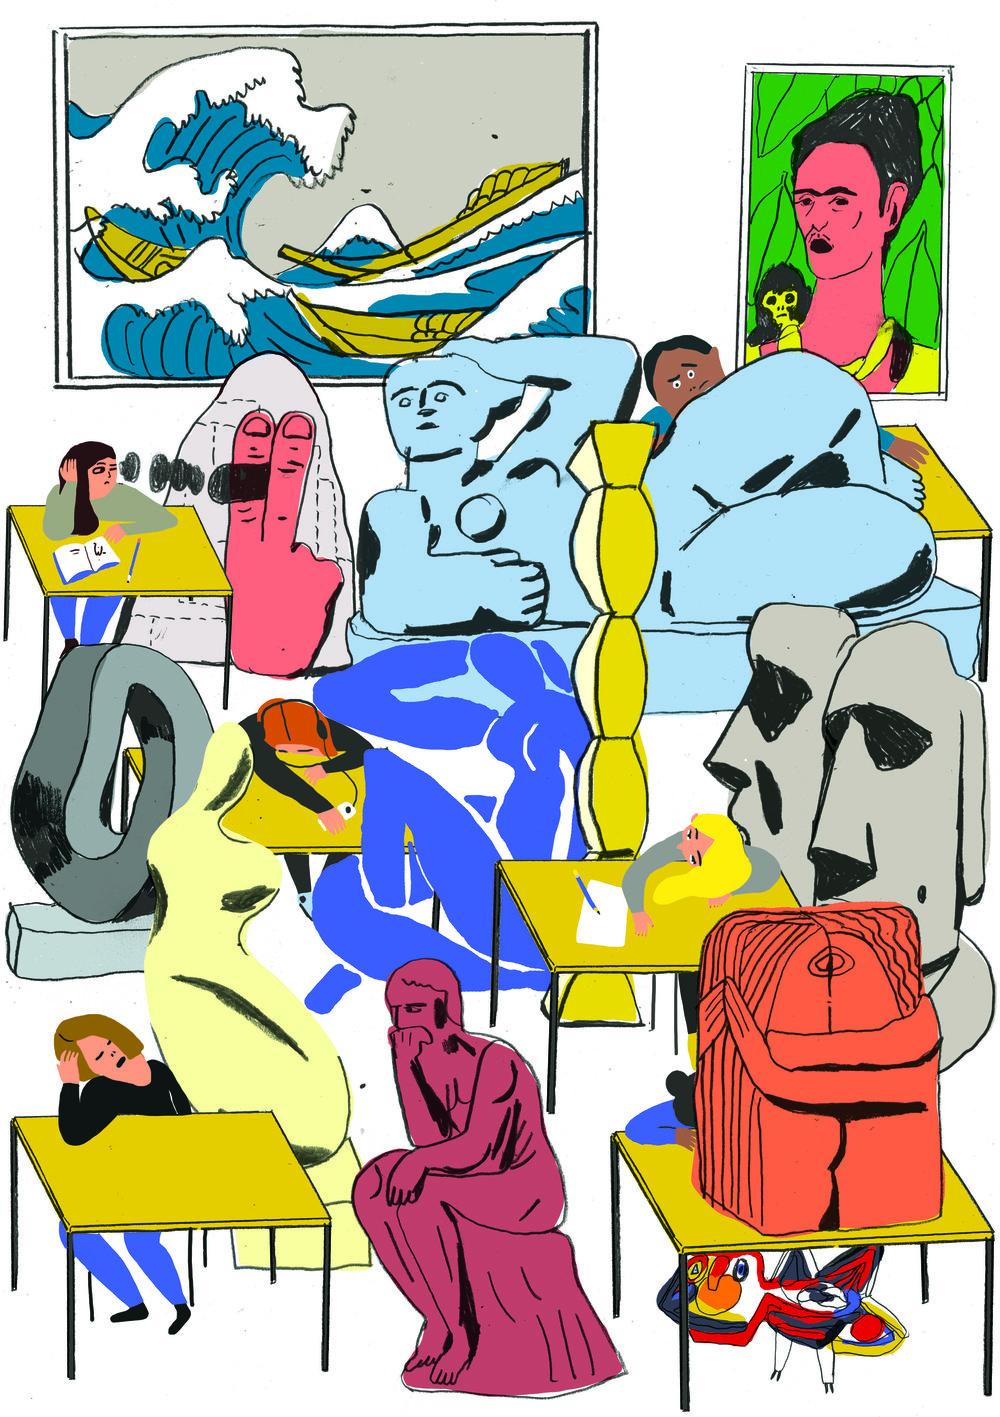 Illustration by Mari Kanstad Johnson